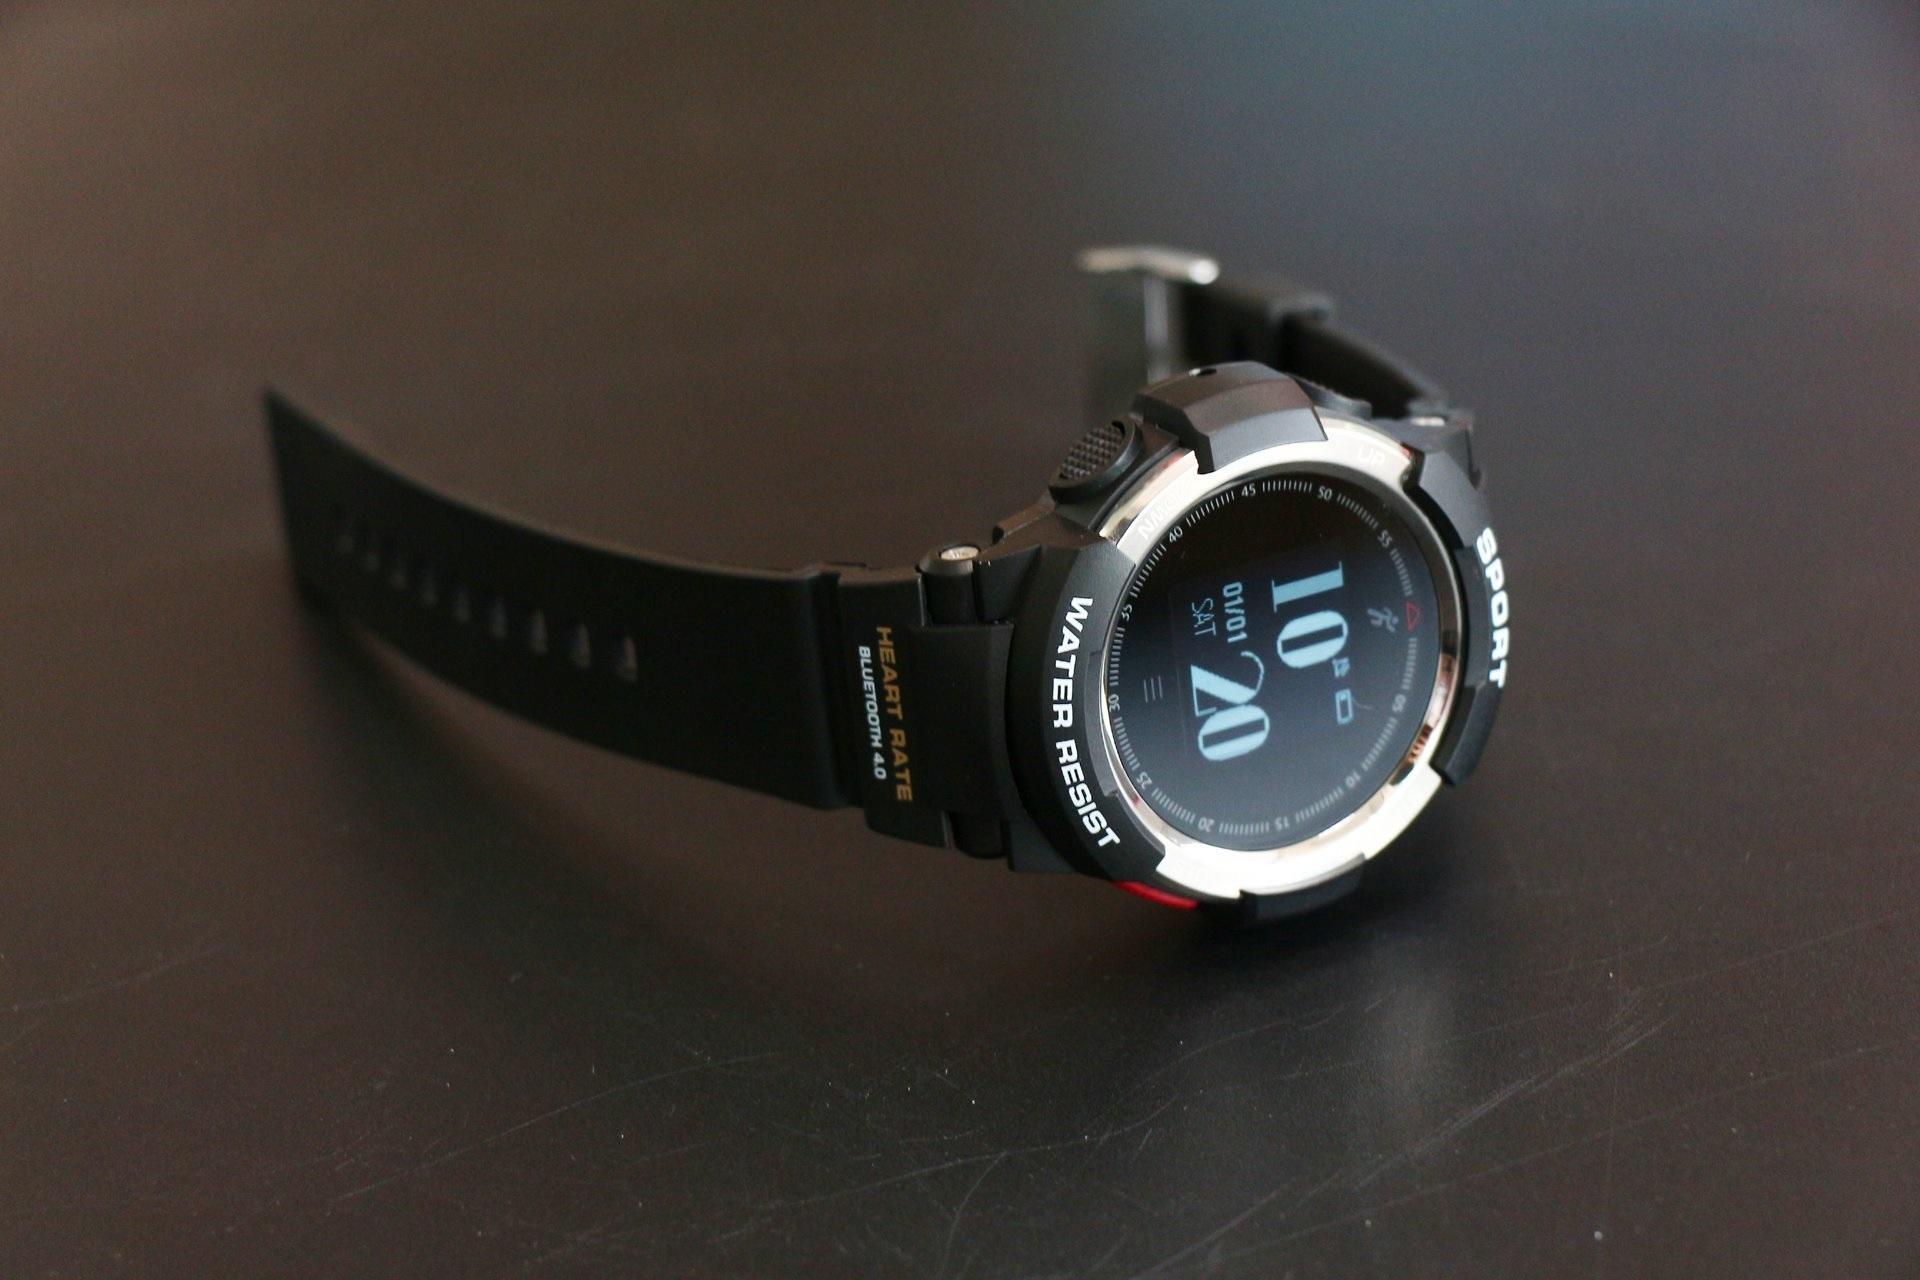 NO. 1 F6 - Diseño